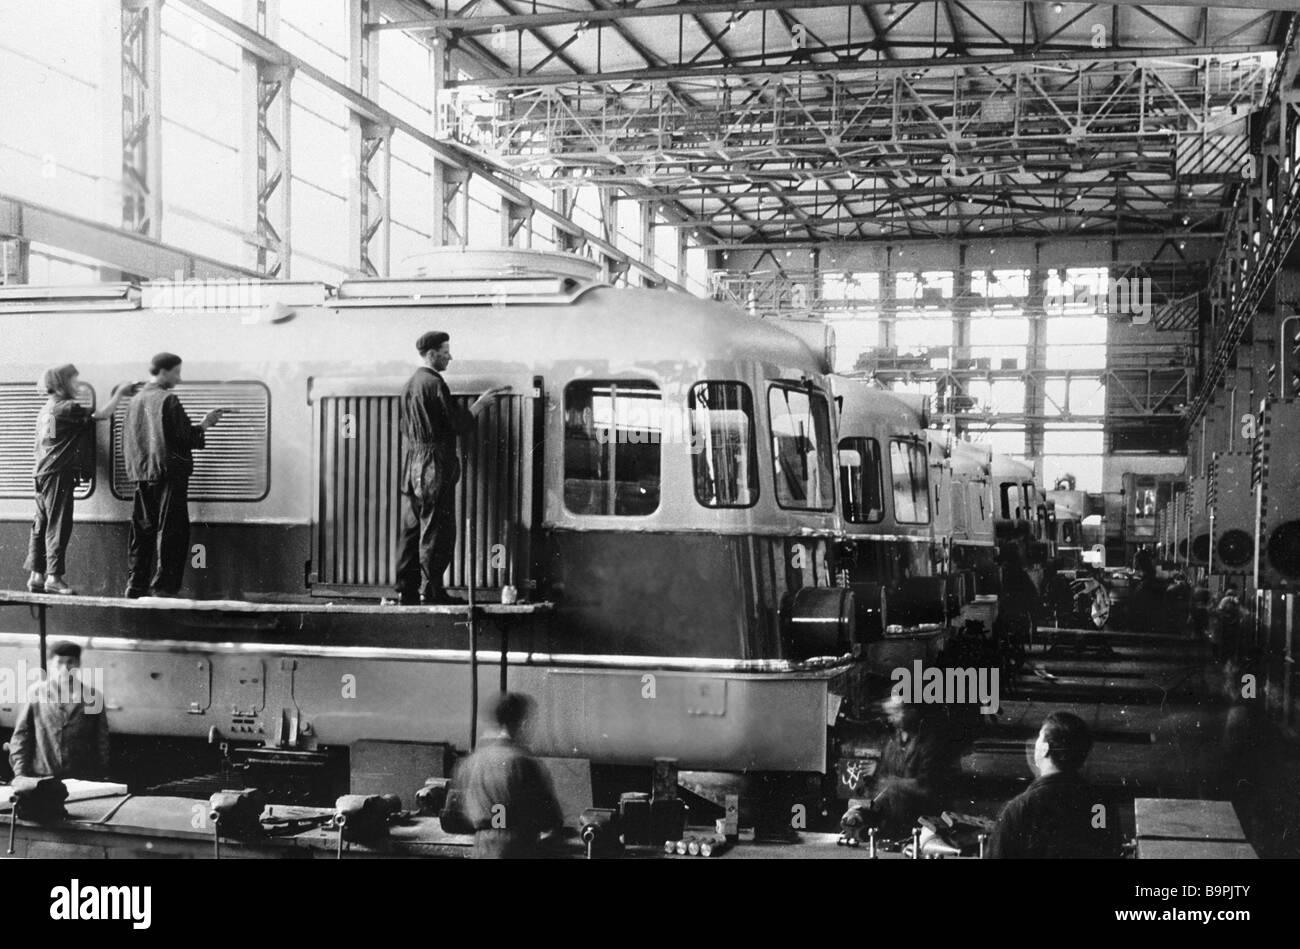 Electrical Locomotive Stock Photos & Electrical Locomotive Stock ...